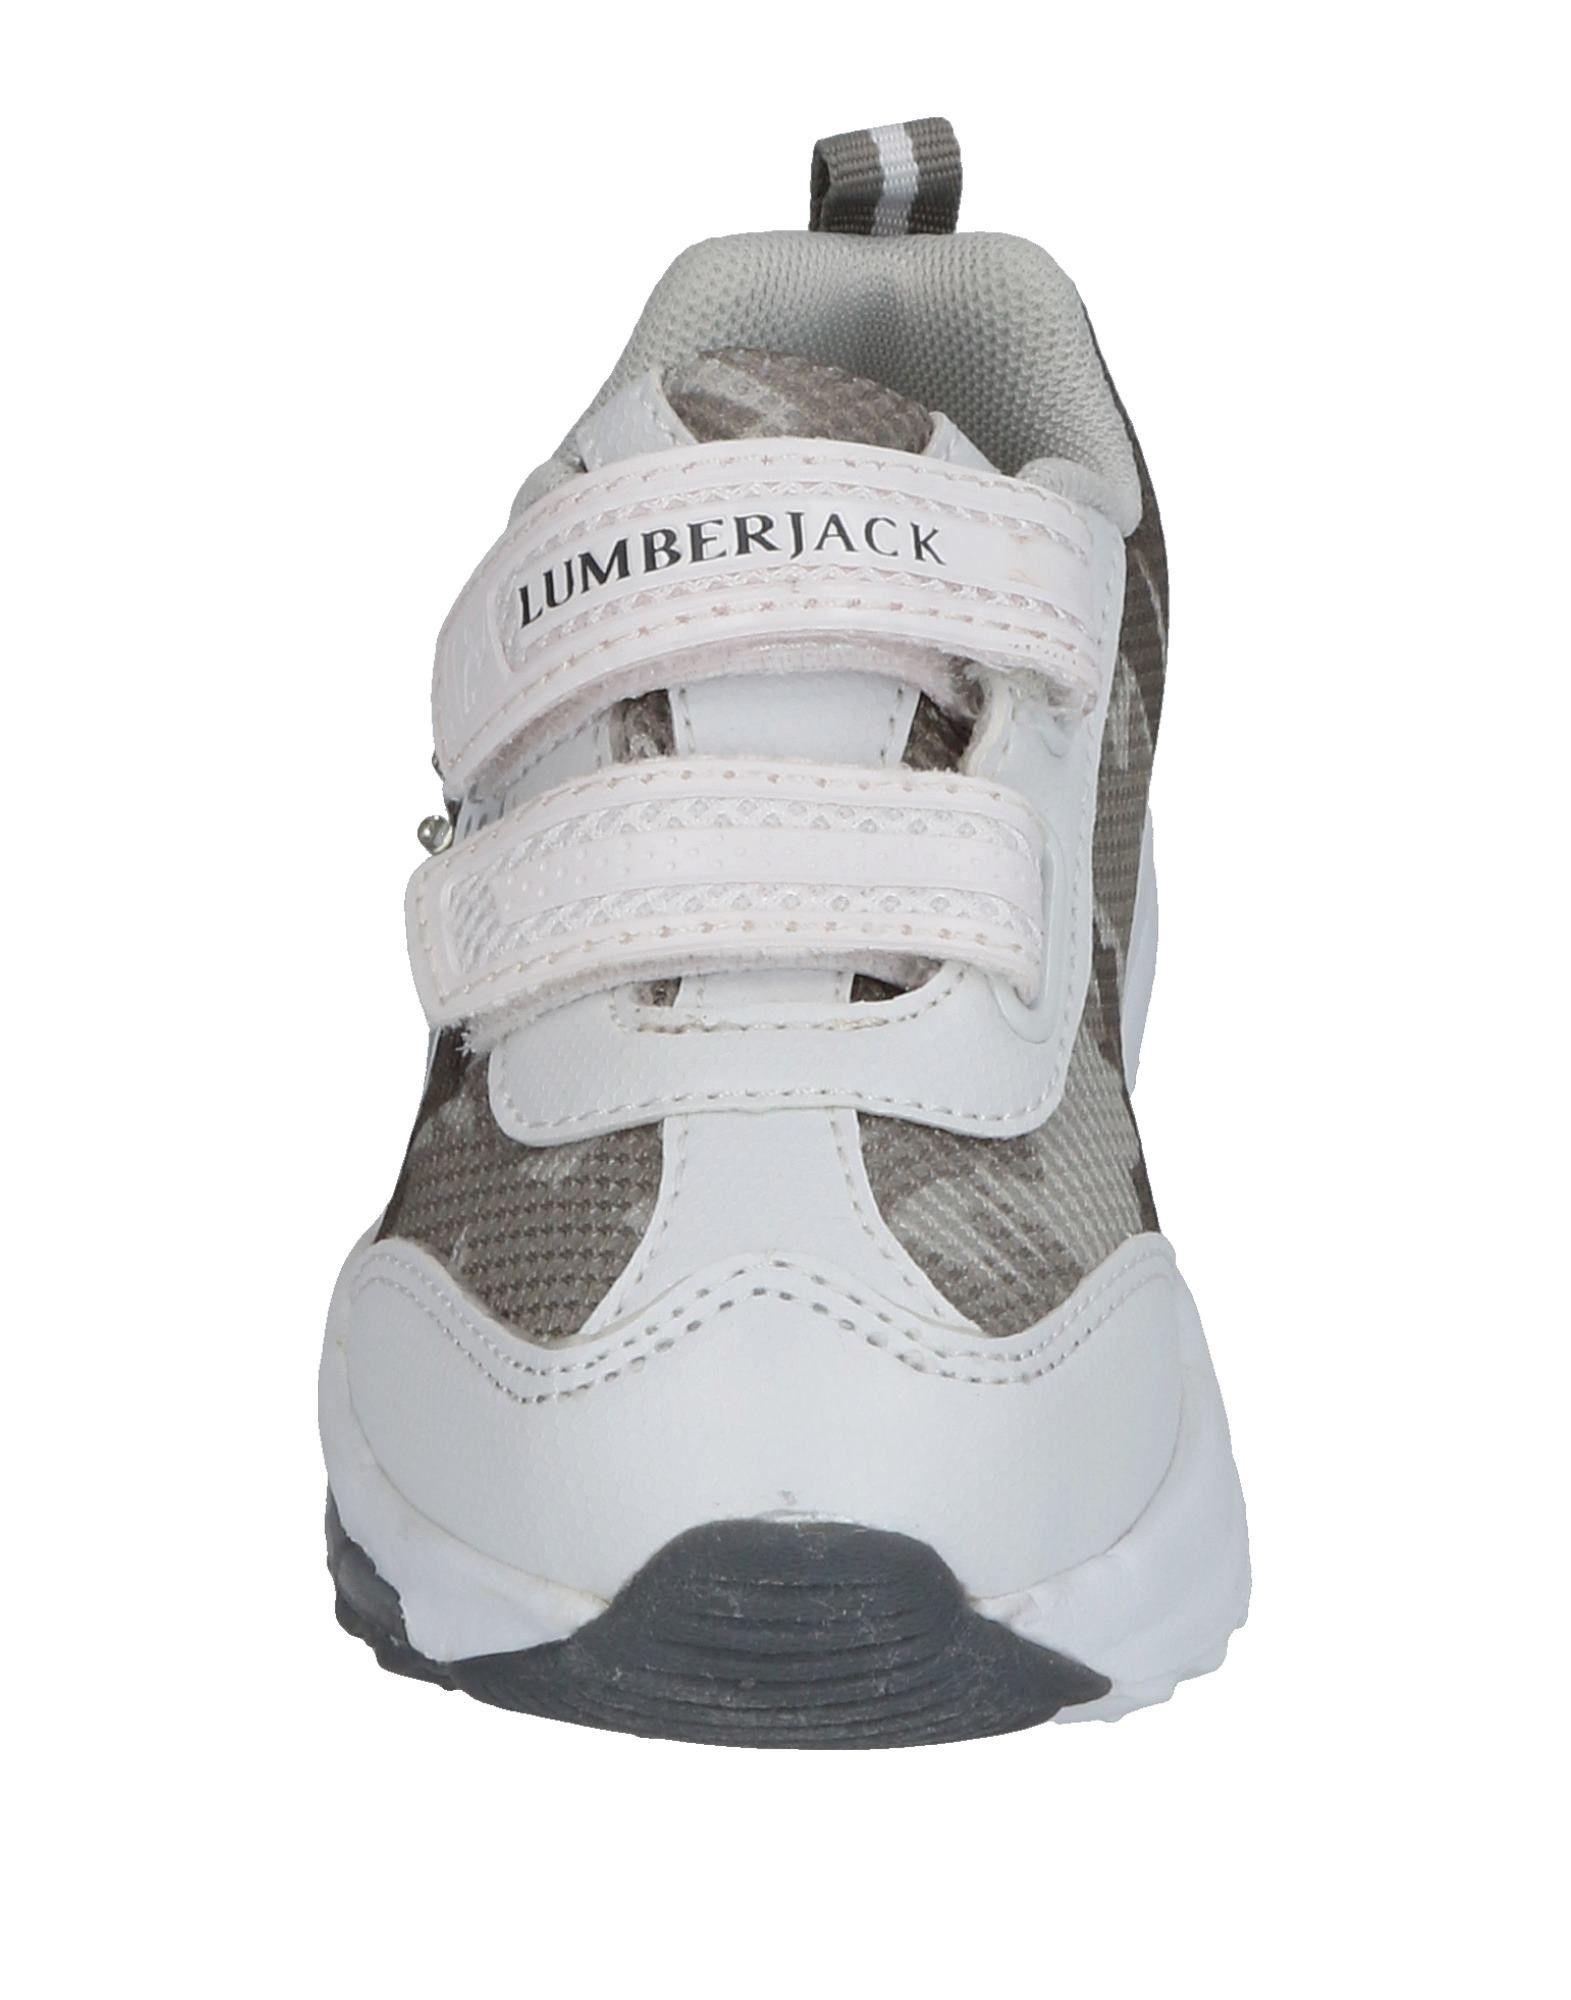 934d50a0e61 LUMBERJACK ΠΑΠΟΥΤΣΙΑ Παπούτσια τένις χαμηλά, Παιδικά αθλητικά παπούτσια  διάφορα, ΠΑΙΔΙ | ΠΑΠΟΥΤΣΙΑ | ΔΙΑΦΟΡΑ